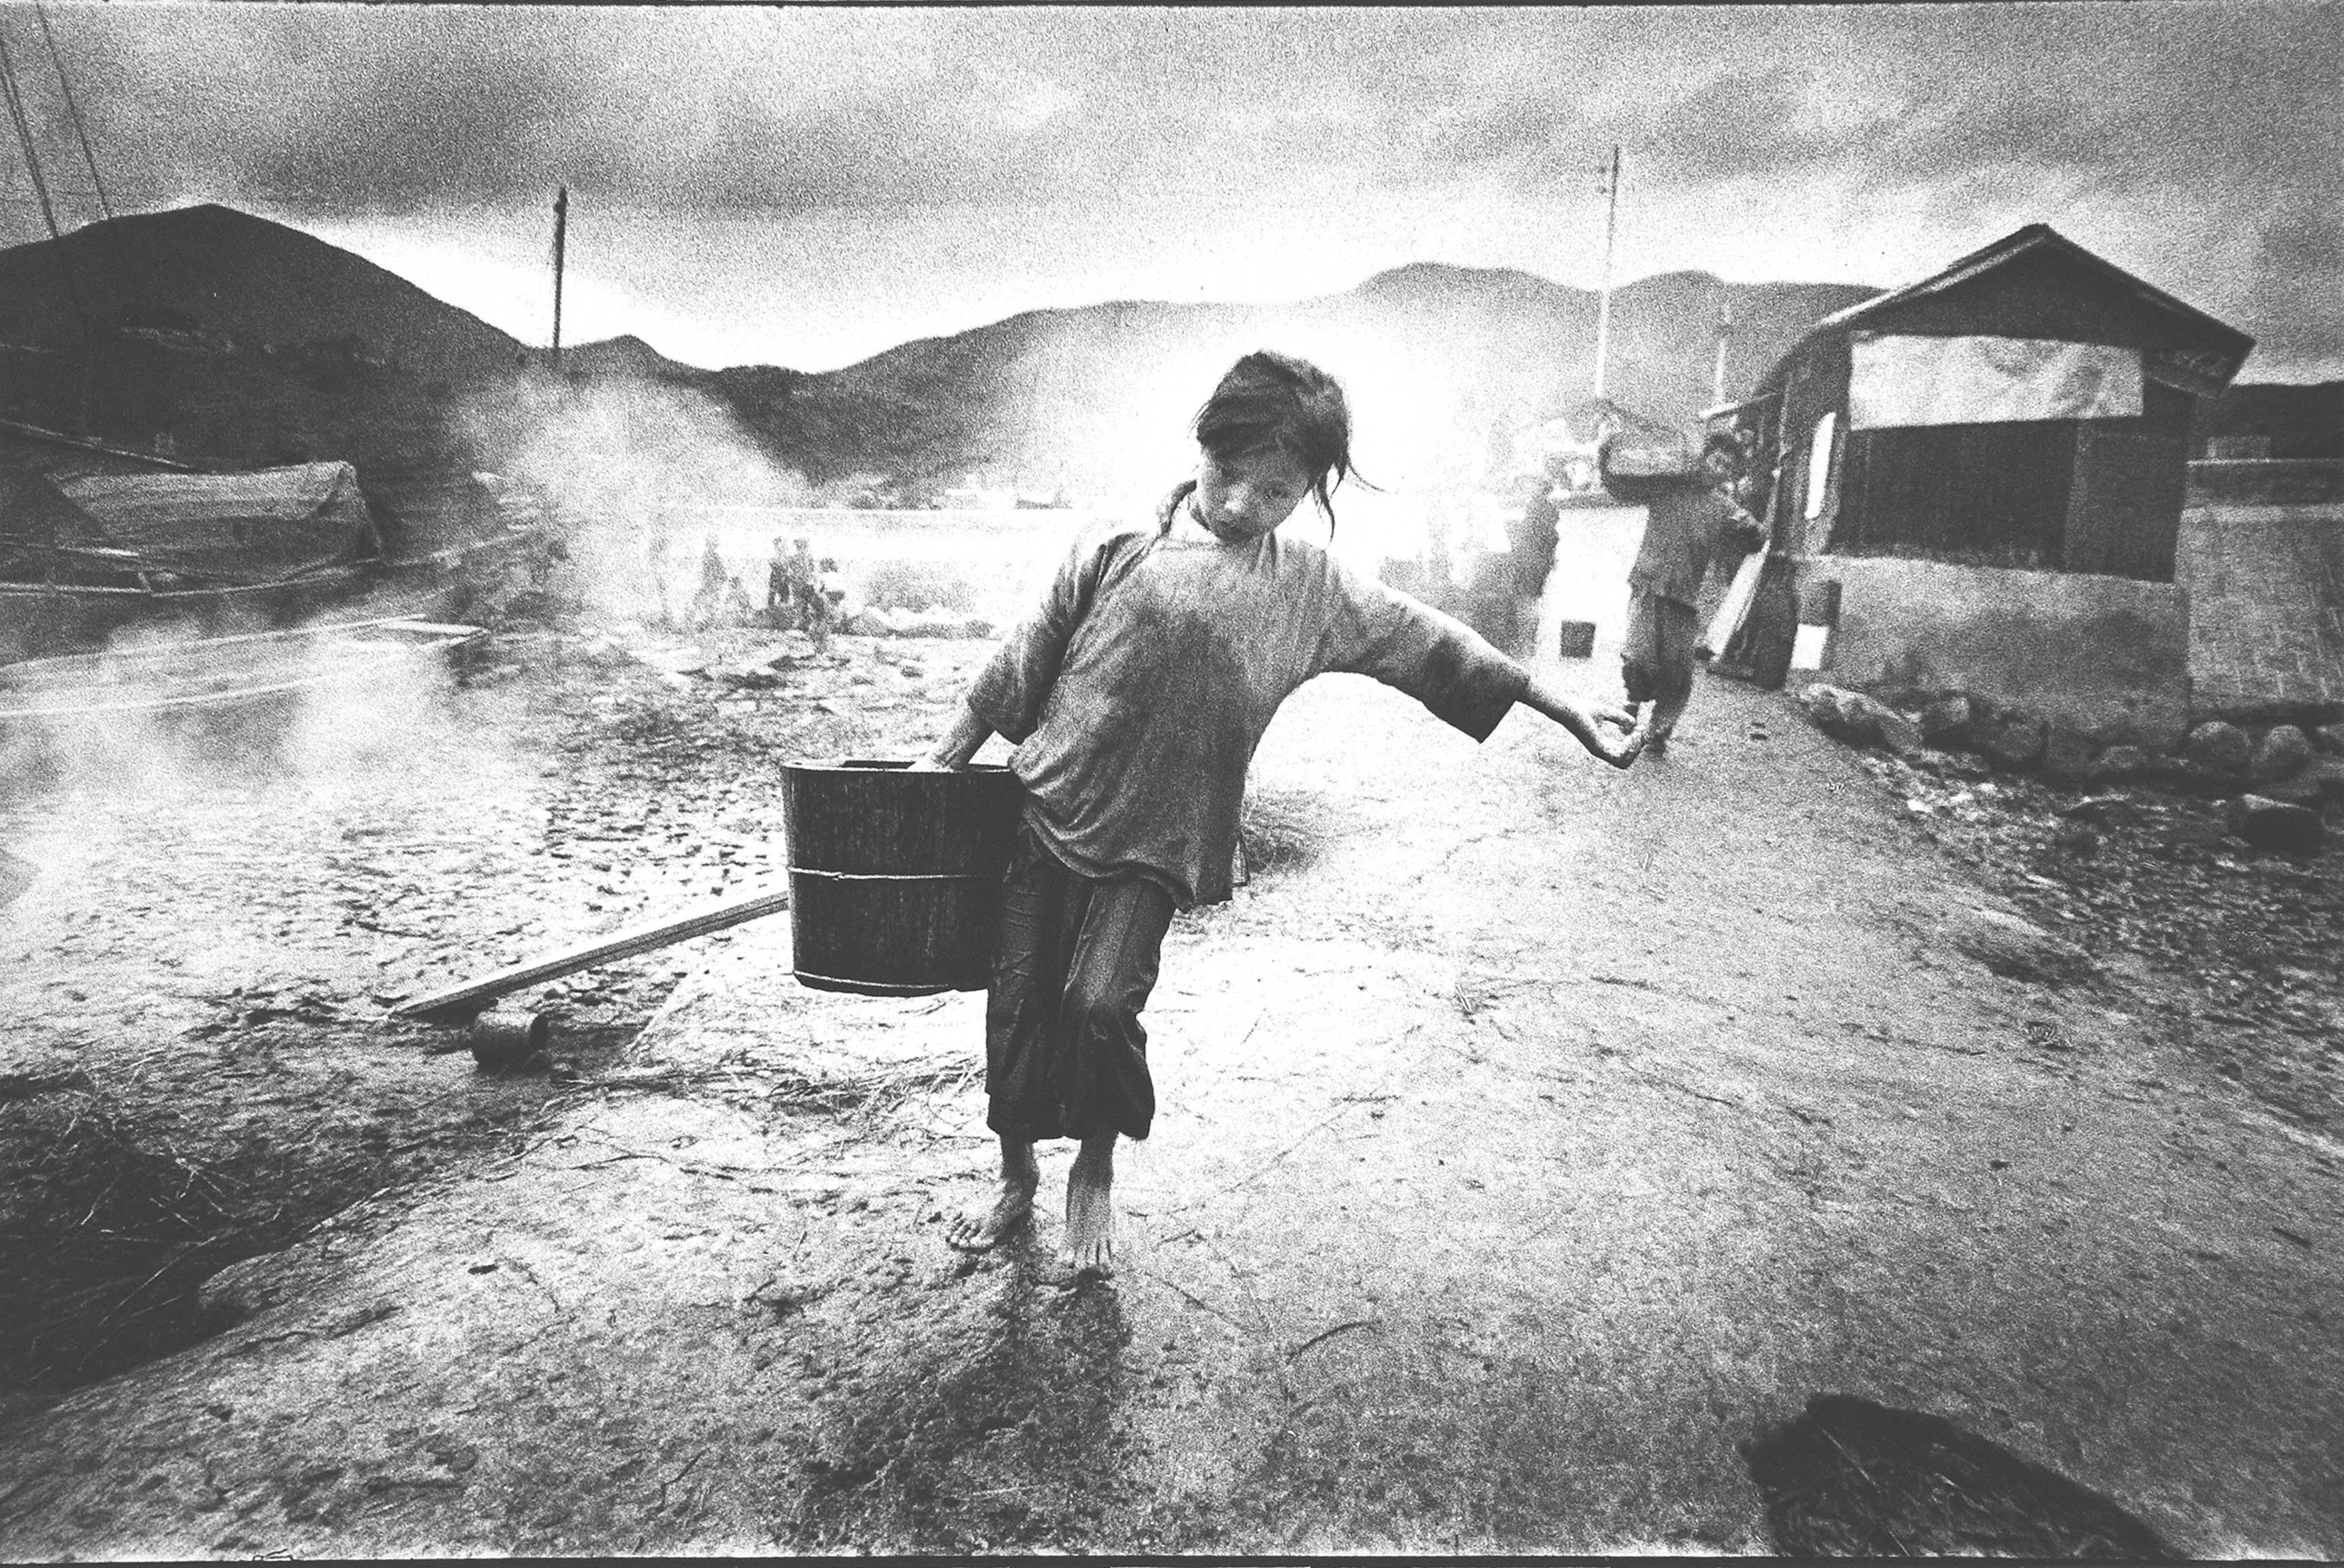 Ed van der Elsken, Réfugiée, Hong Kong, 1959-1960. Nederlands Fotomuseum Rotterdam © Ed van der Elsken / Collections spéciales de l'université de Leyde